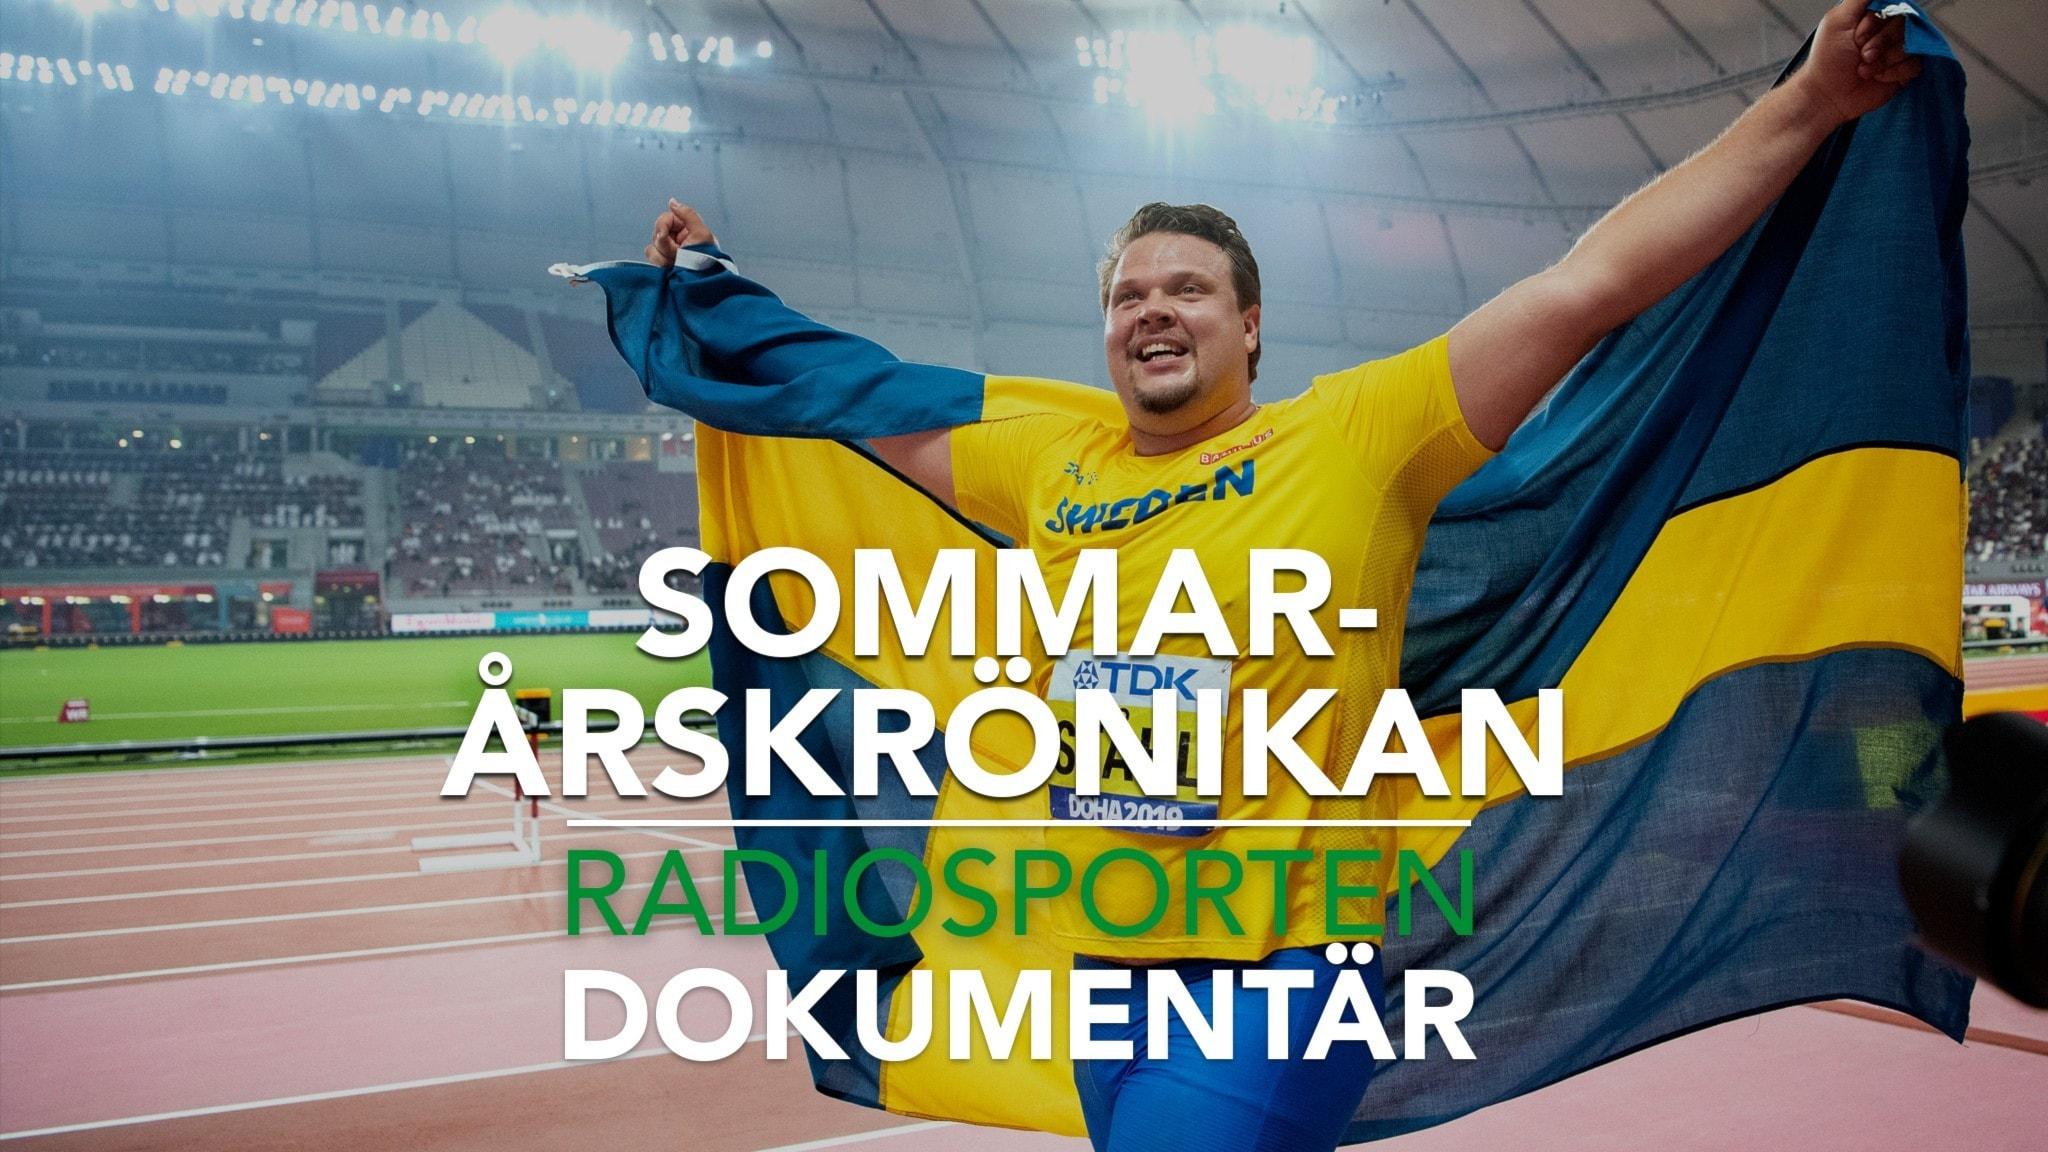 Special: Sommarårskrönikan 2019